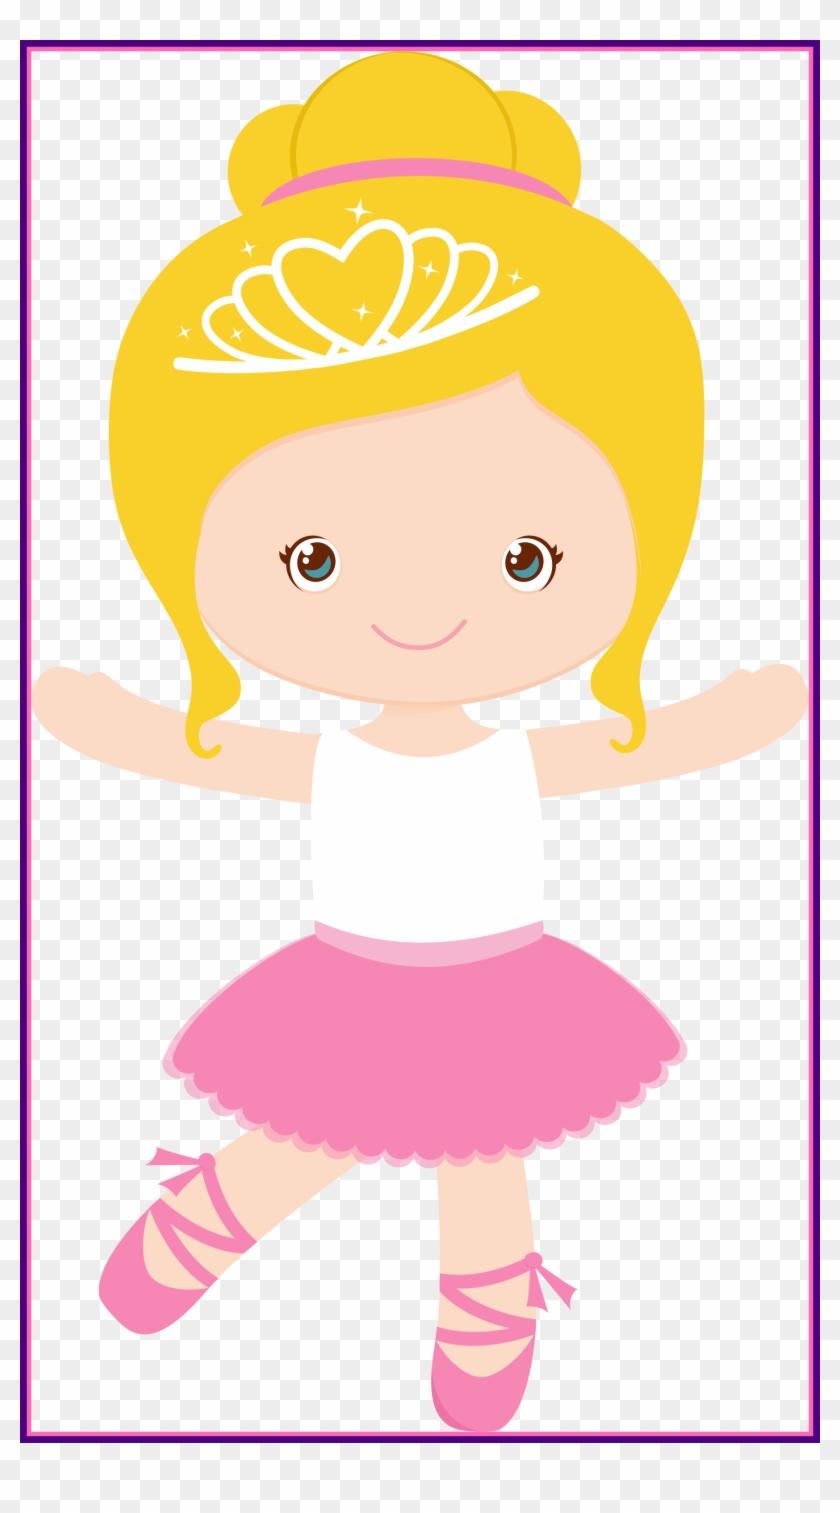 hight resolution of little girl ballerina clipart bailarina png fundo transparente